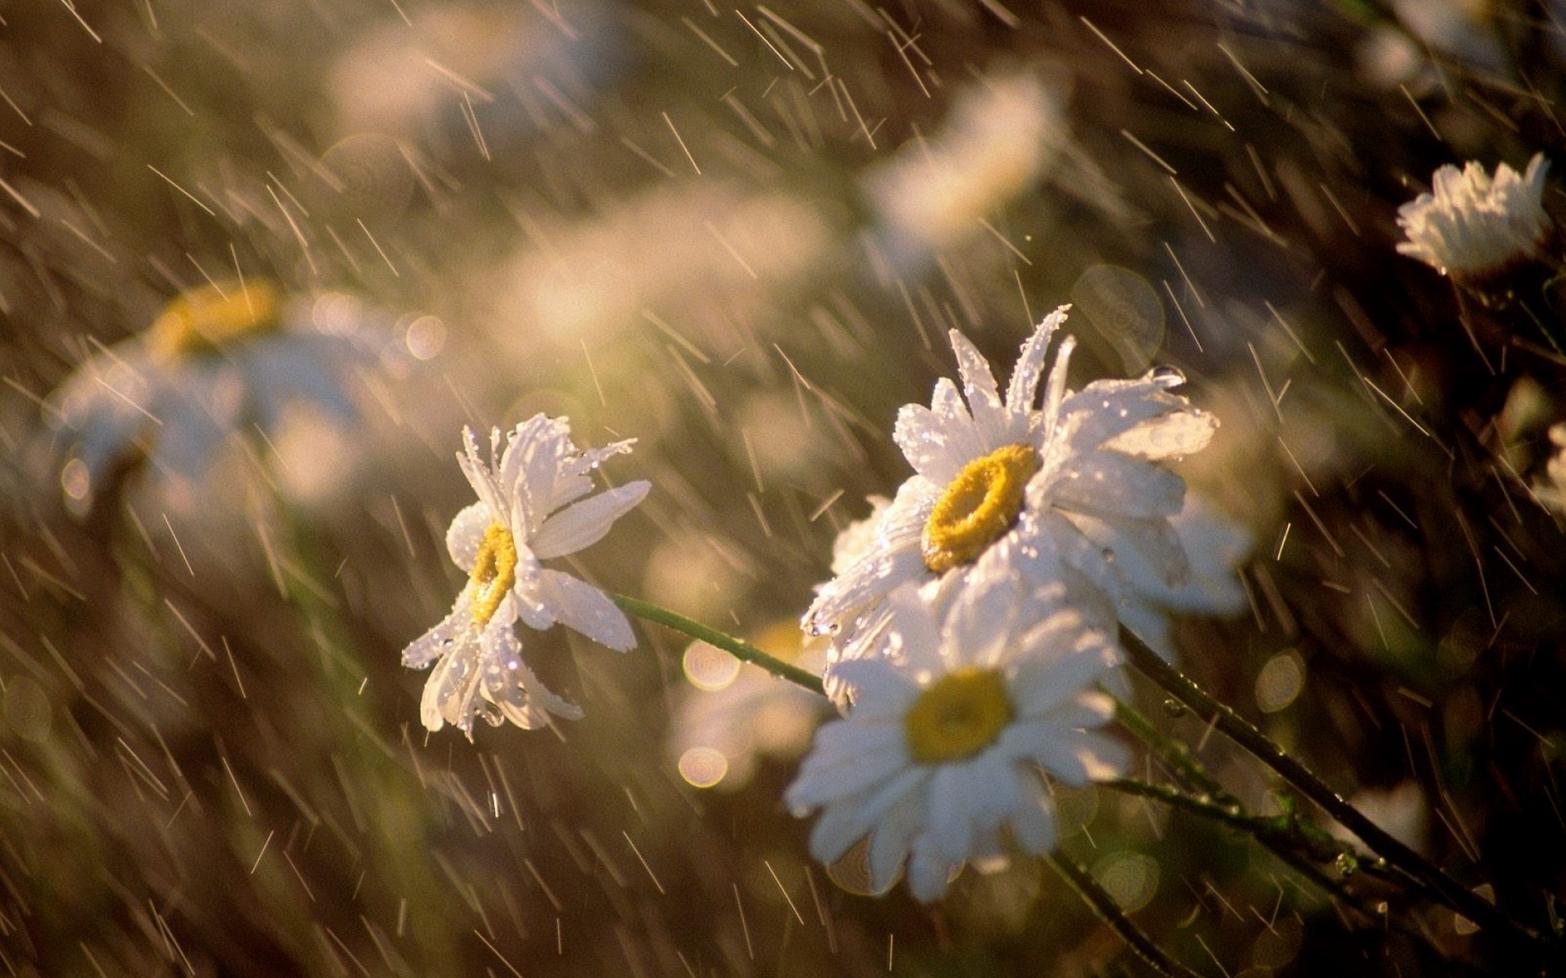 фотографии дождя 3